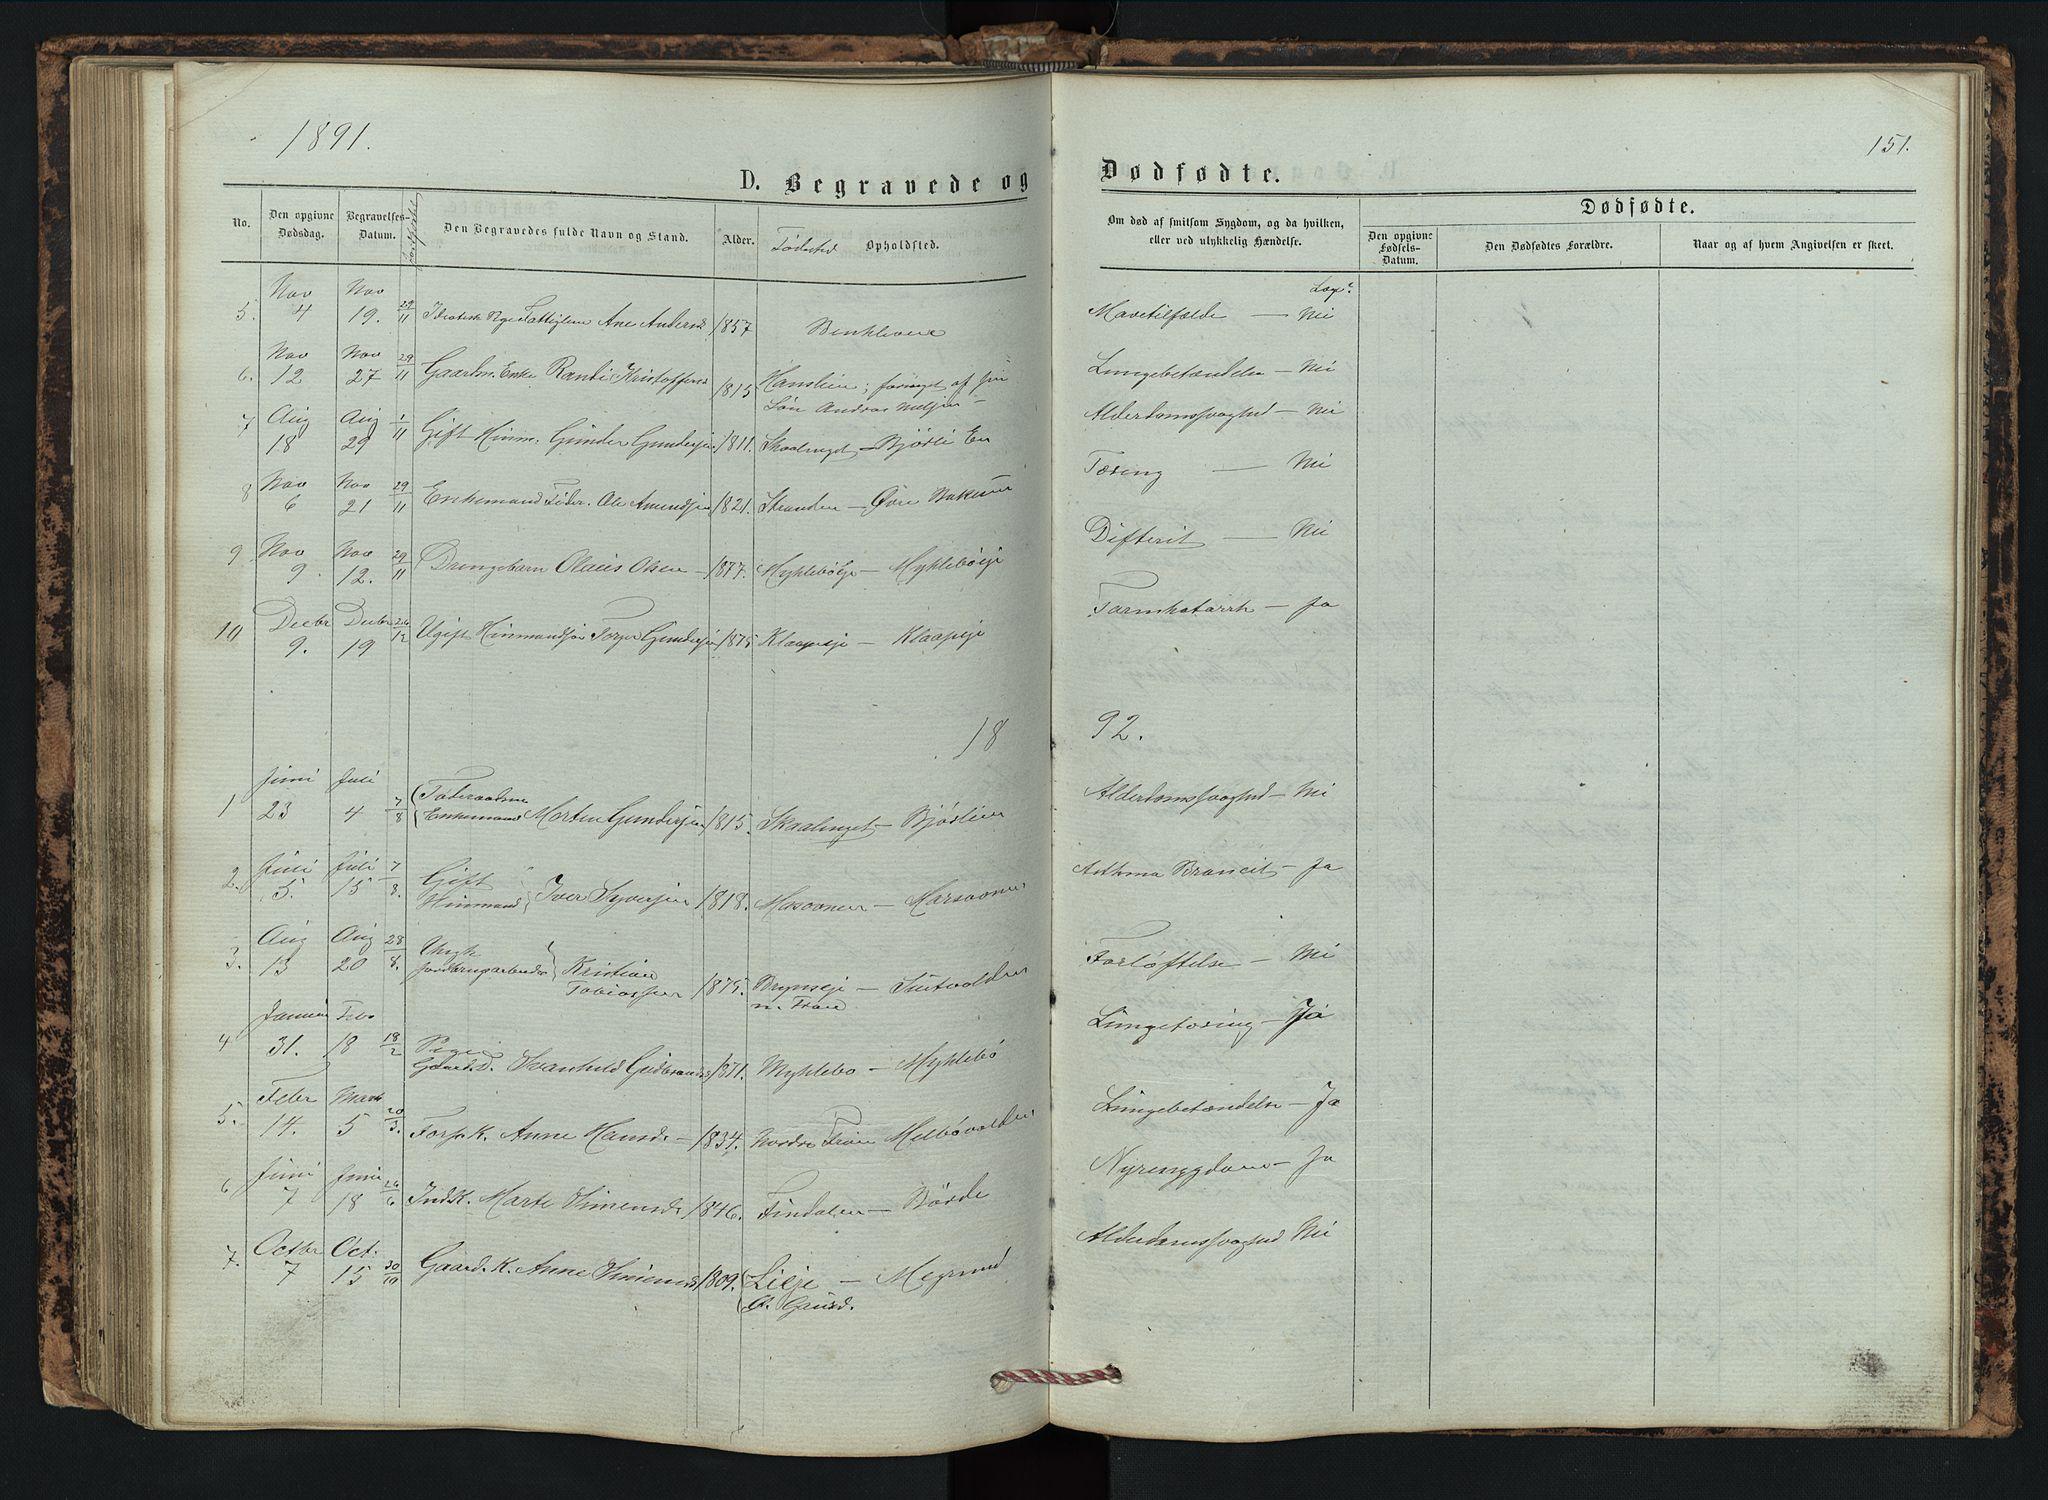 SAH, Vestre Gausdal prestekontor, Klokkerbok nr. 2, 1874-1897, s. 151